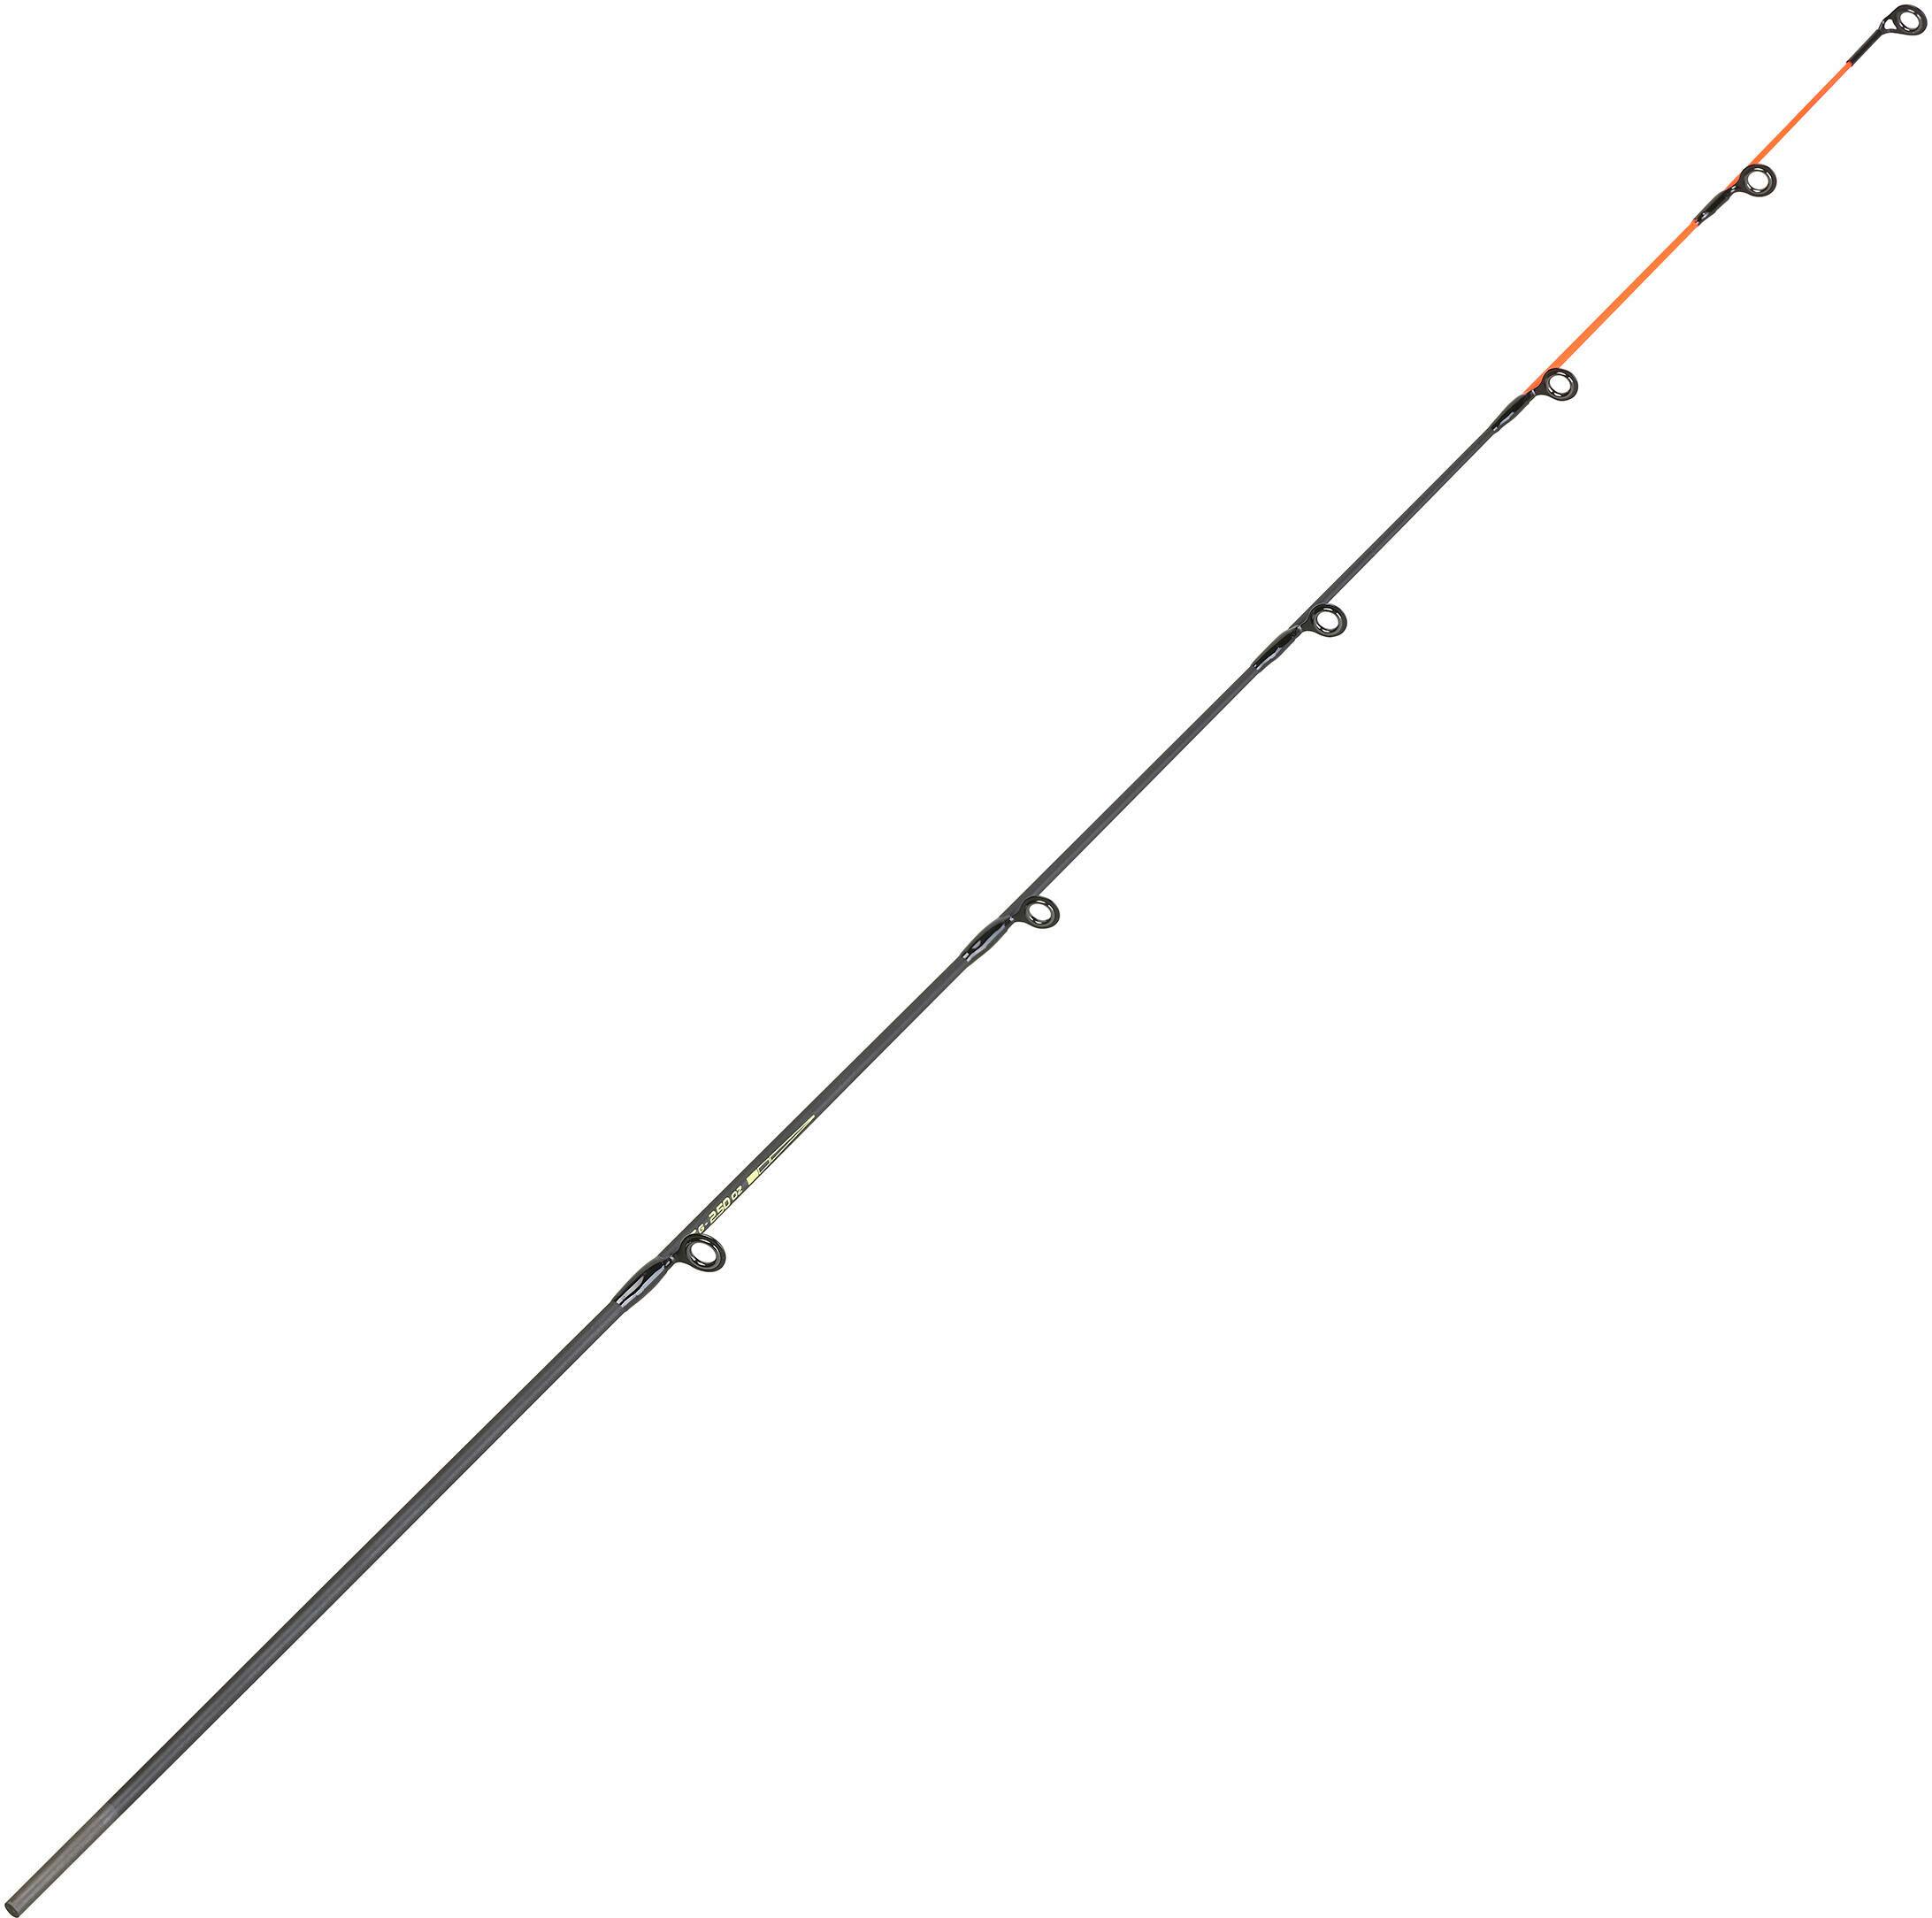 Szczytówka 75 g do wędki Caperlan Sensitiv-500 carp 3,60-3,90 m